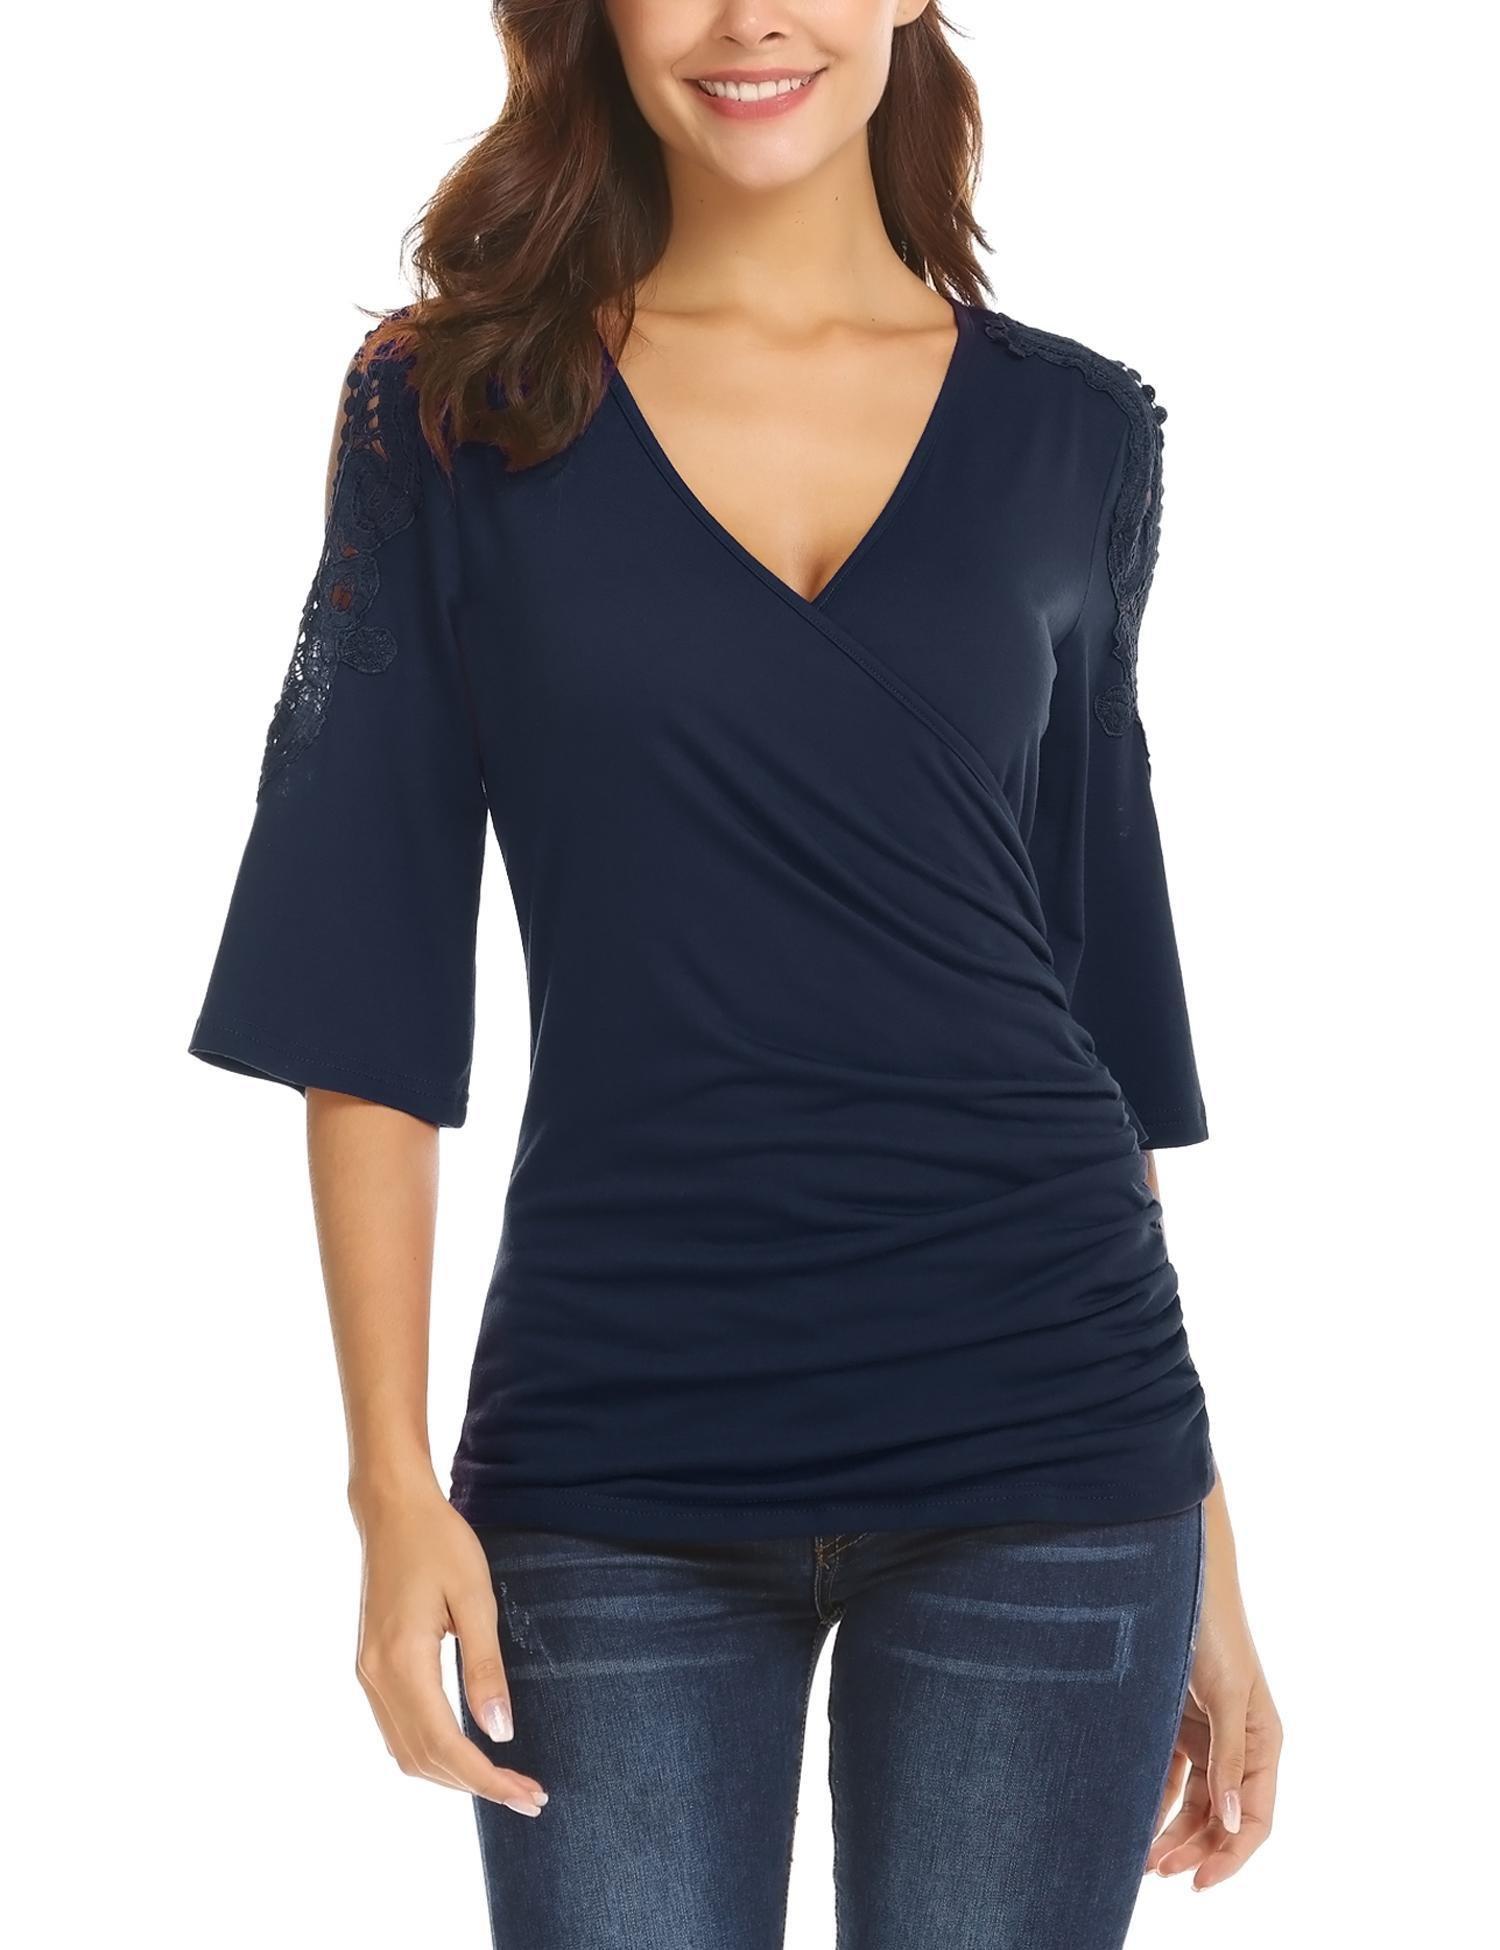 Gfones Women's Sexy Deep V Neck Shirts Cross Wrap Front Surplice Tops S